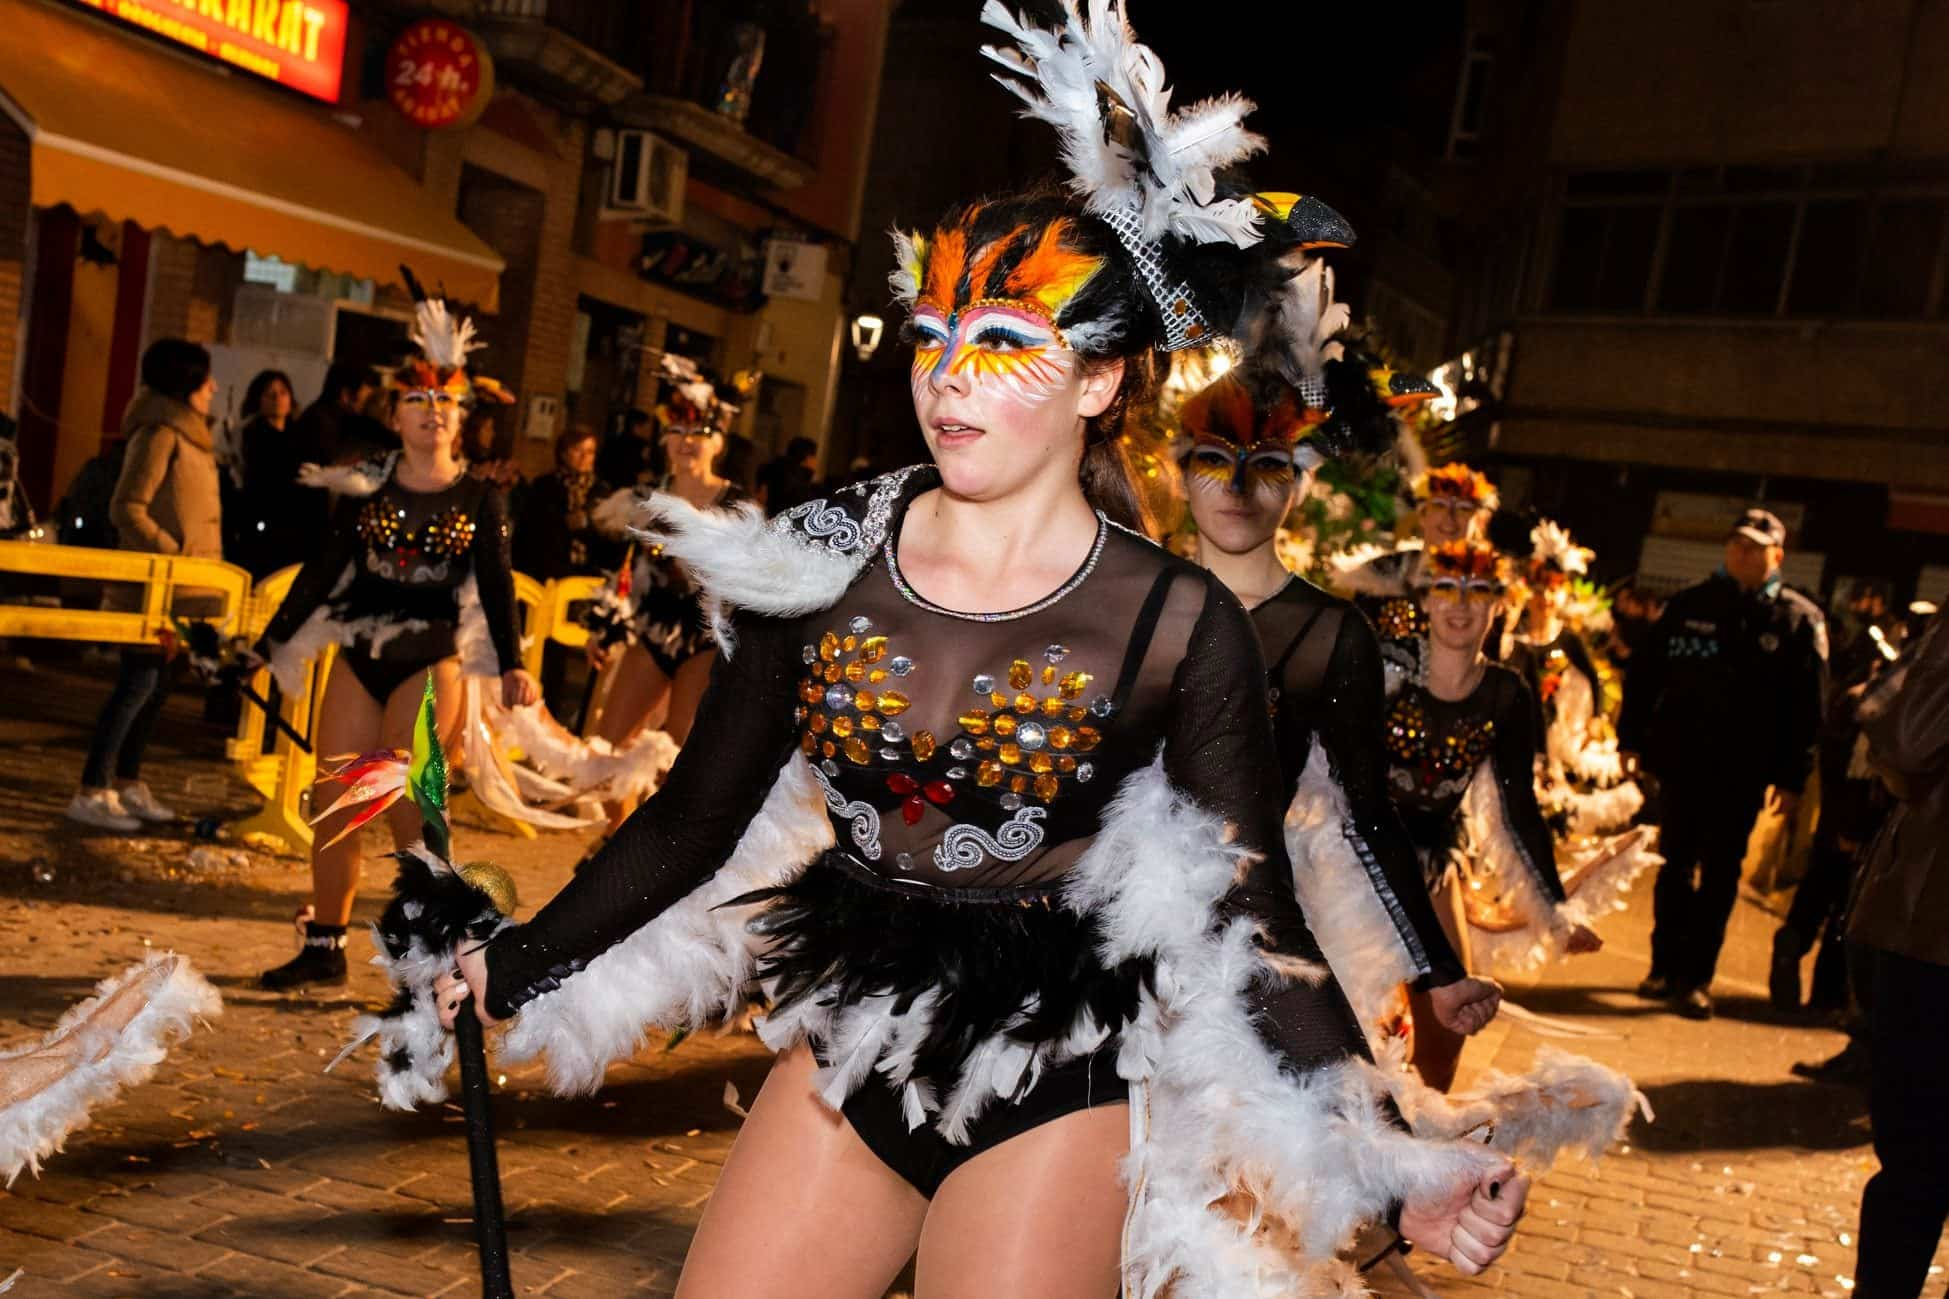 Carnaval de herencia 2020 ofertorio 73 - Selección de fotografías del Ofertorio del Carnaval de Herencia